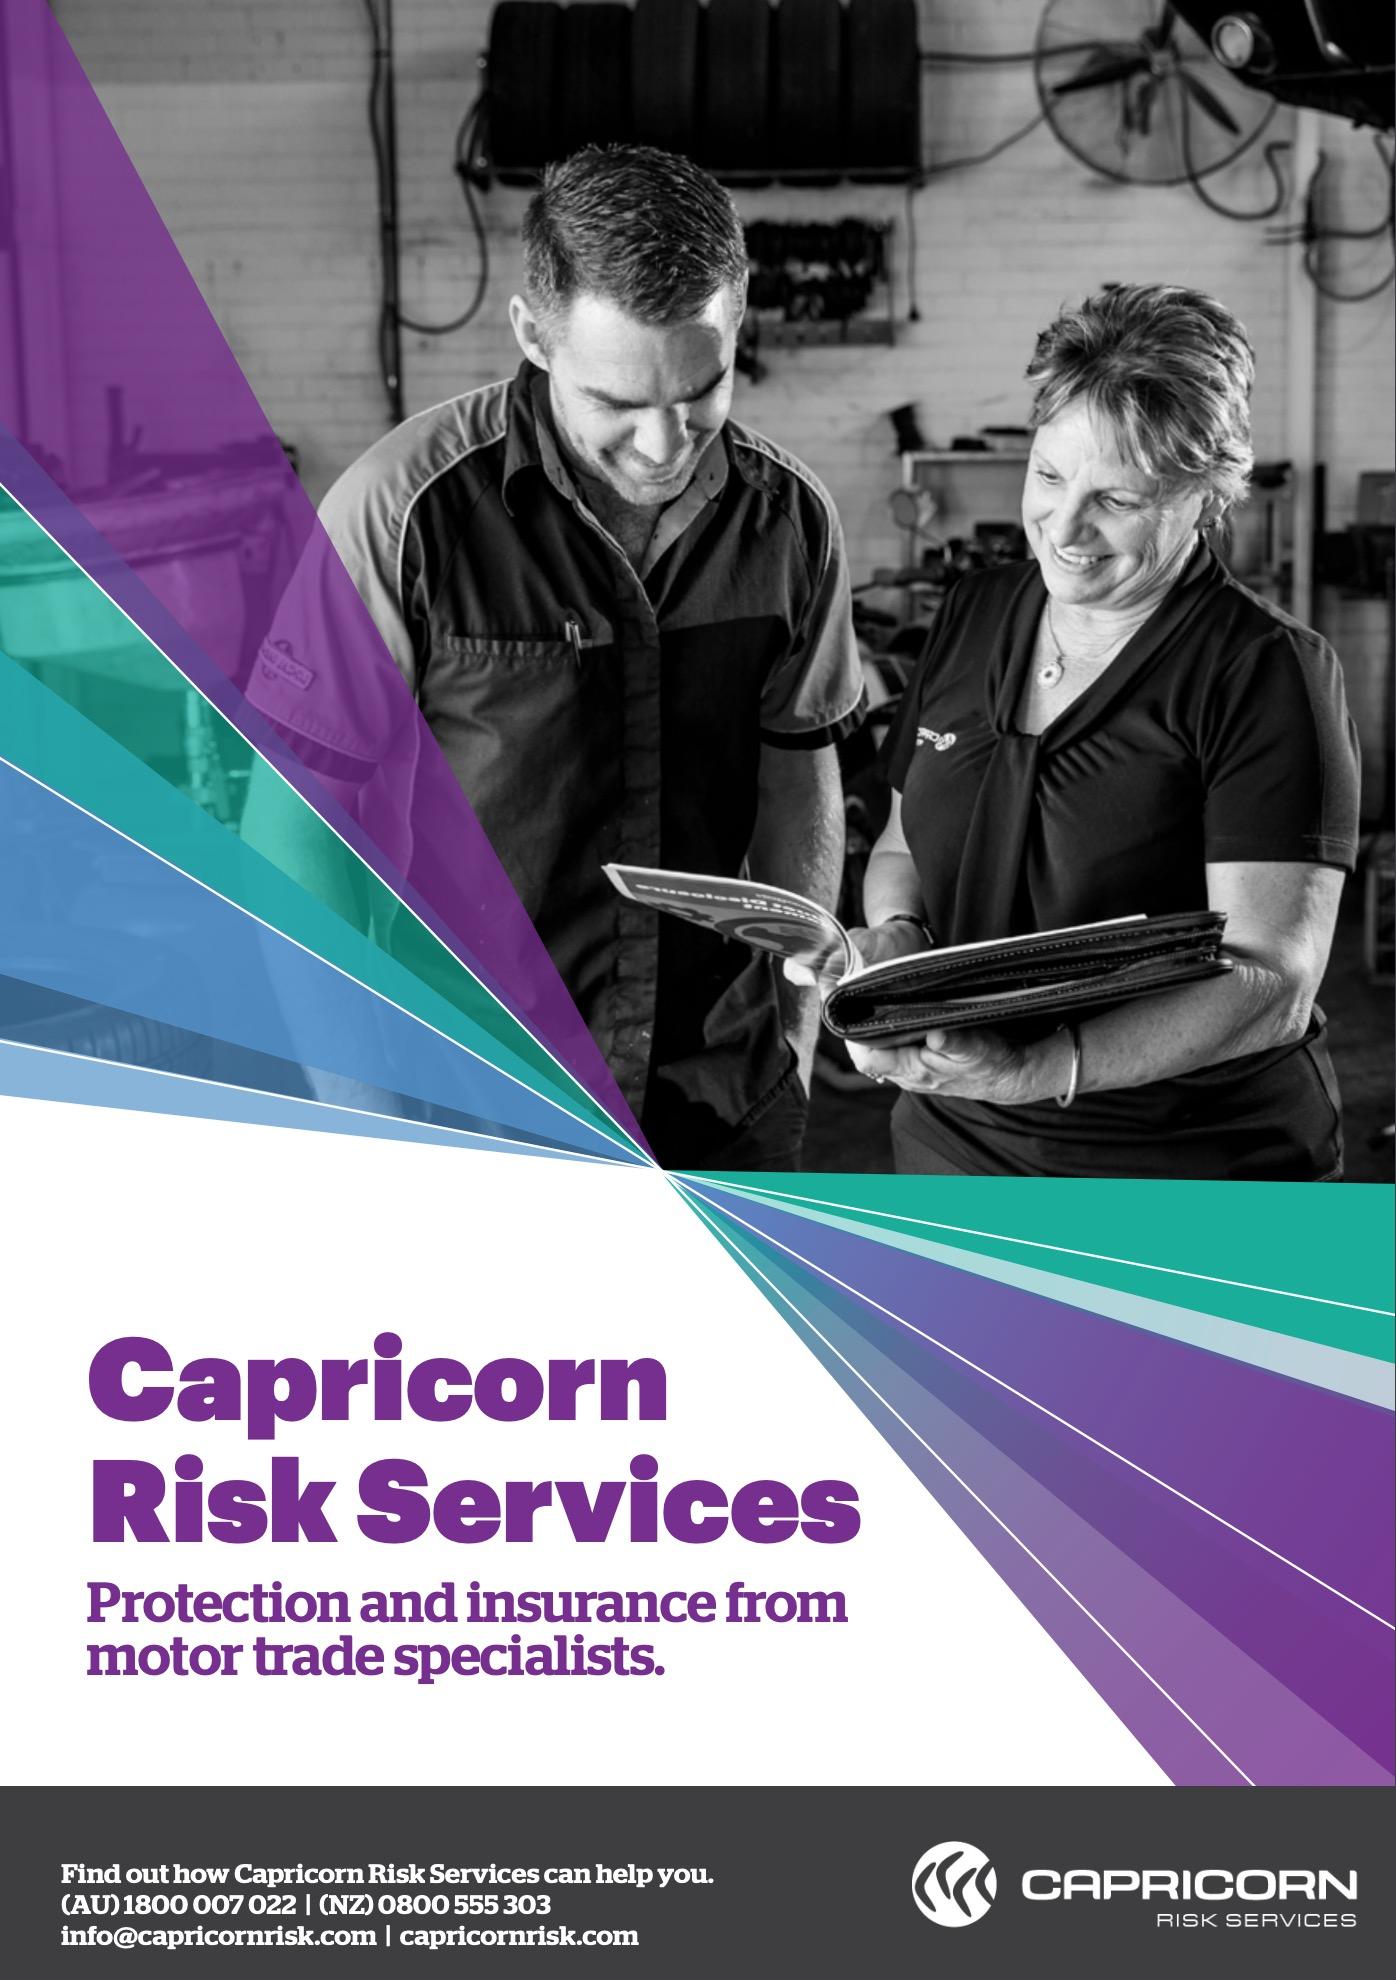 Ammon_Creative-Commercial_Advertising_Photography-Capricorn_Perth6.jpg